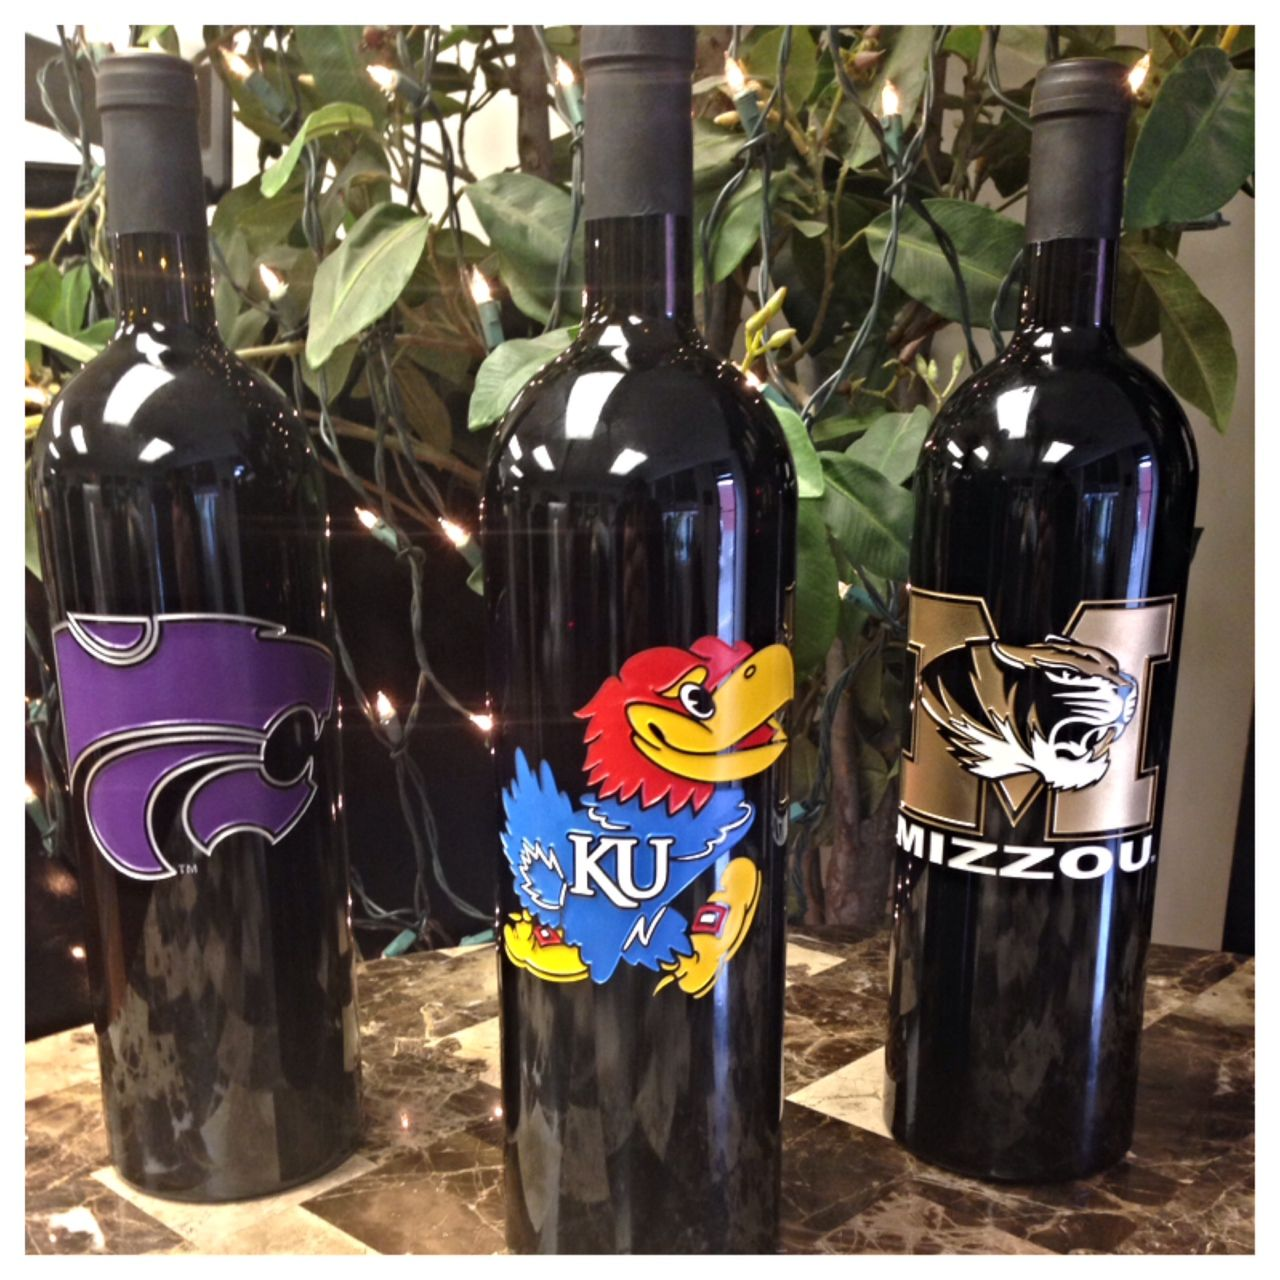 Lots Of School Spirit In These Wine Bottles! #wine